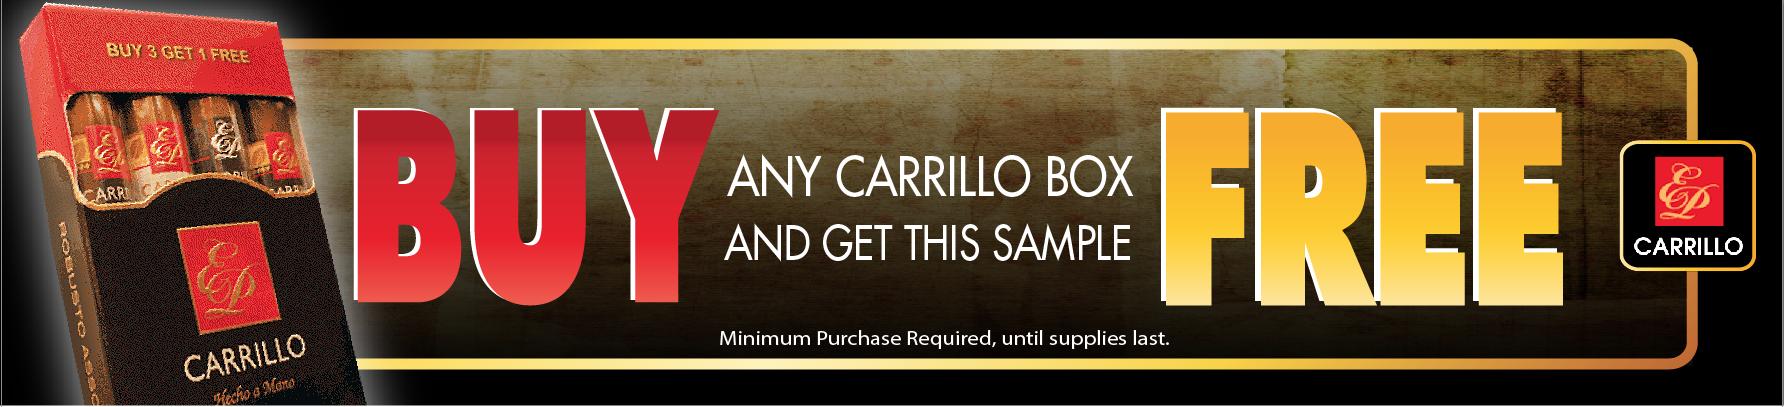 epc carrillo free sampler